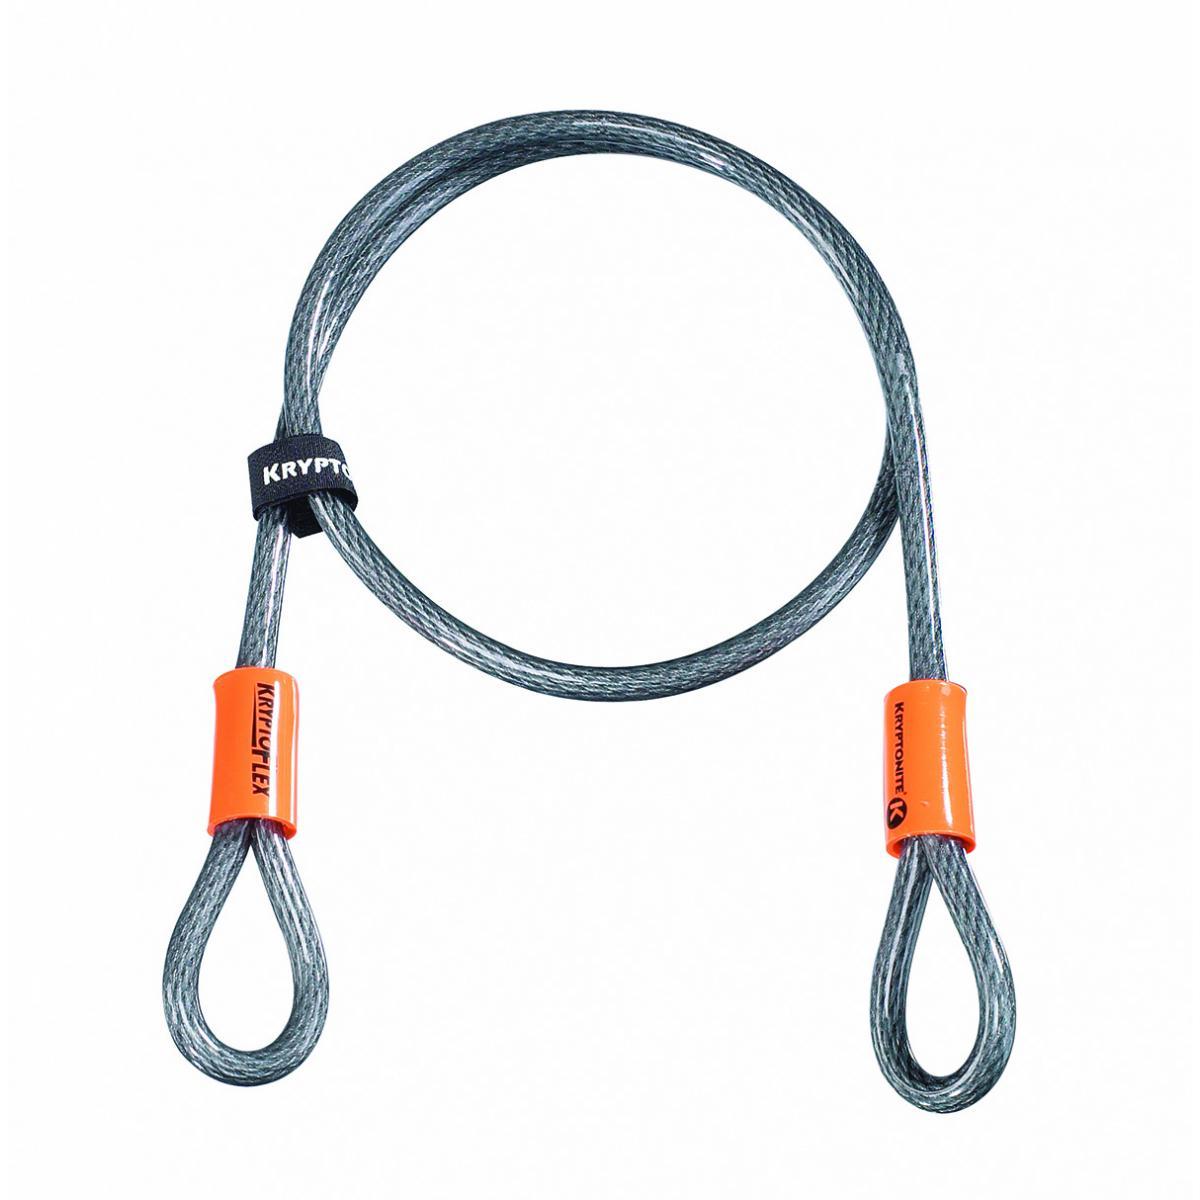 KRYPTOFLEX 410 LOOPED CABLE  (10x1200)